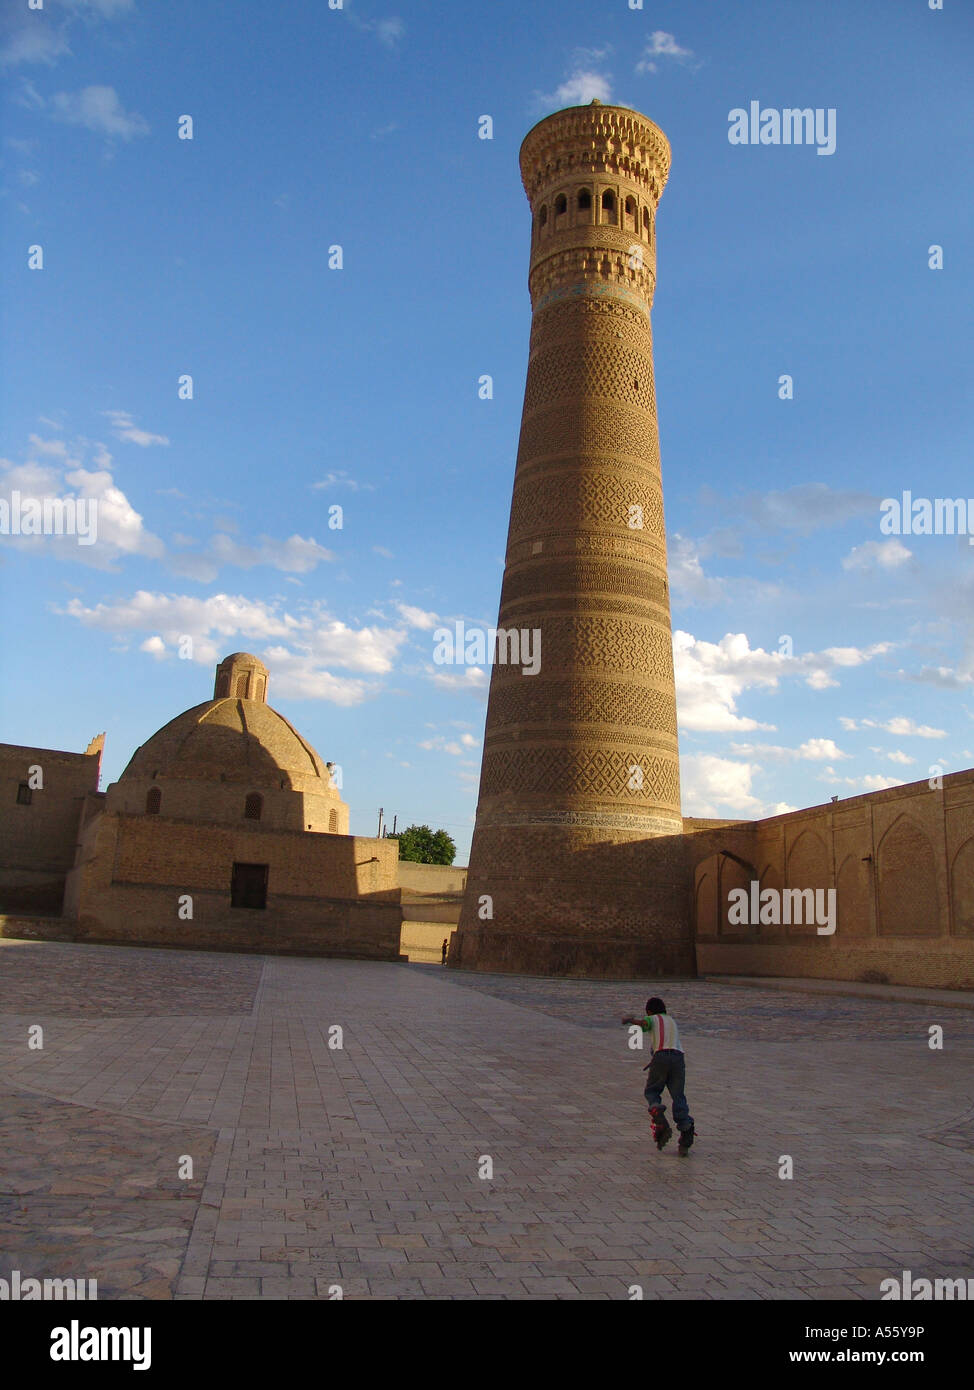 Painet iw2388 in Zentralasien Sowjetunion Bilder Islam moslem Seiden Straße Usbekistan Kalon Minarett Buchara Stockbild